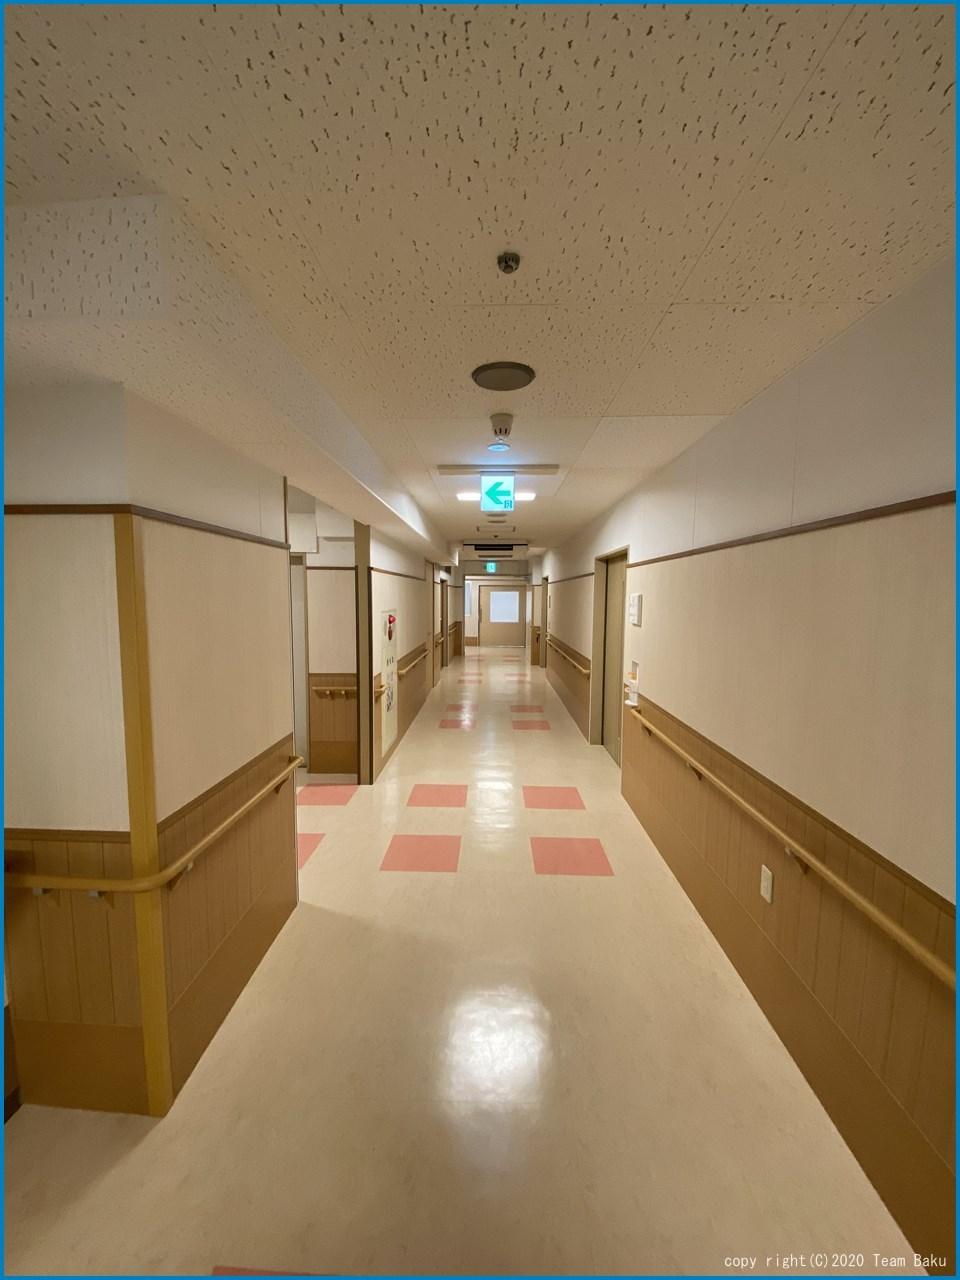 N病院グループ Nナーシング南館 改修・増築工事 6_c0376508_17104704.jpg